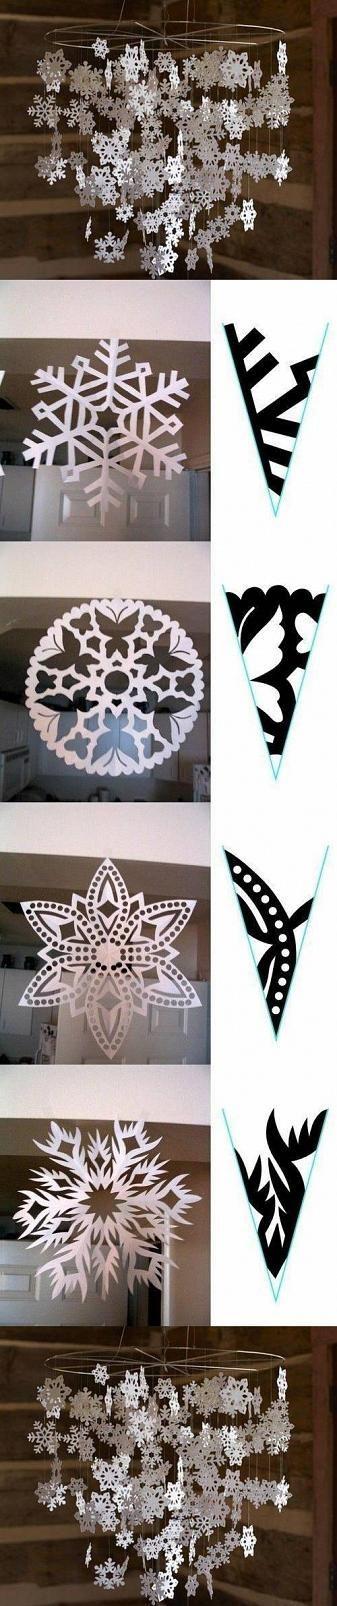 Christmas snowflake chandelier. So pretty!